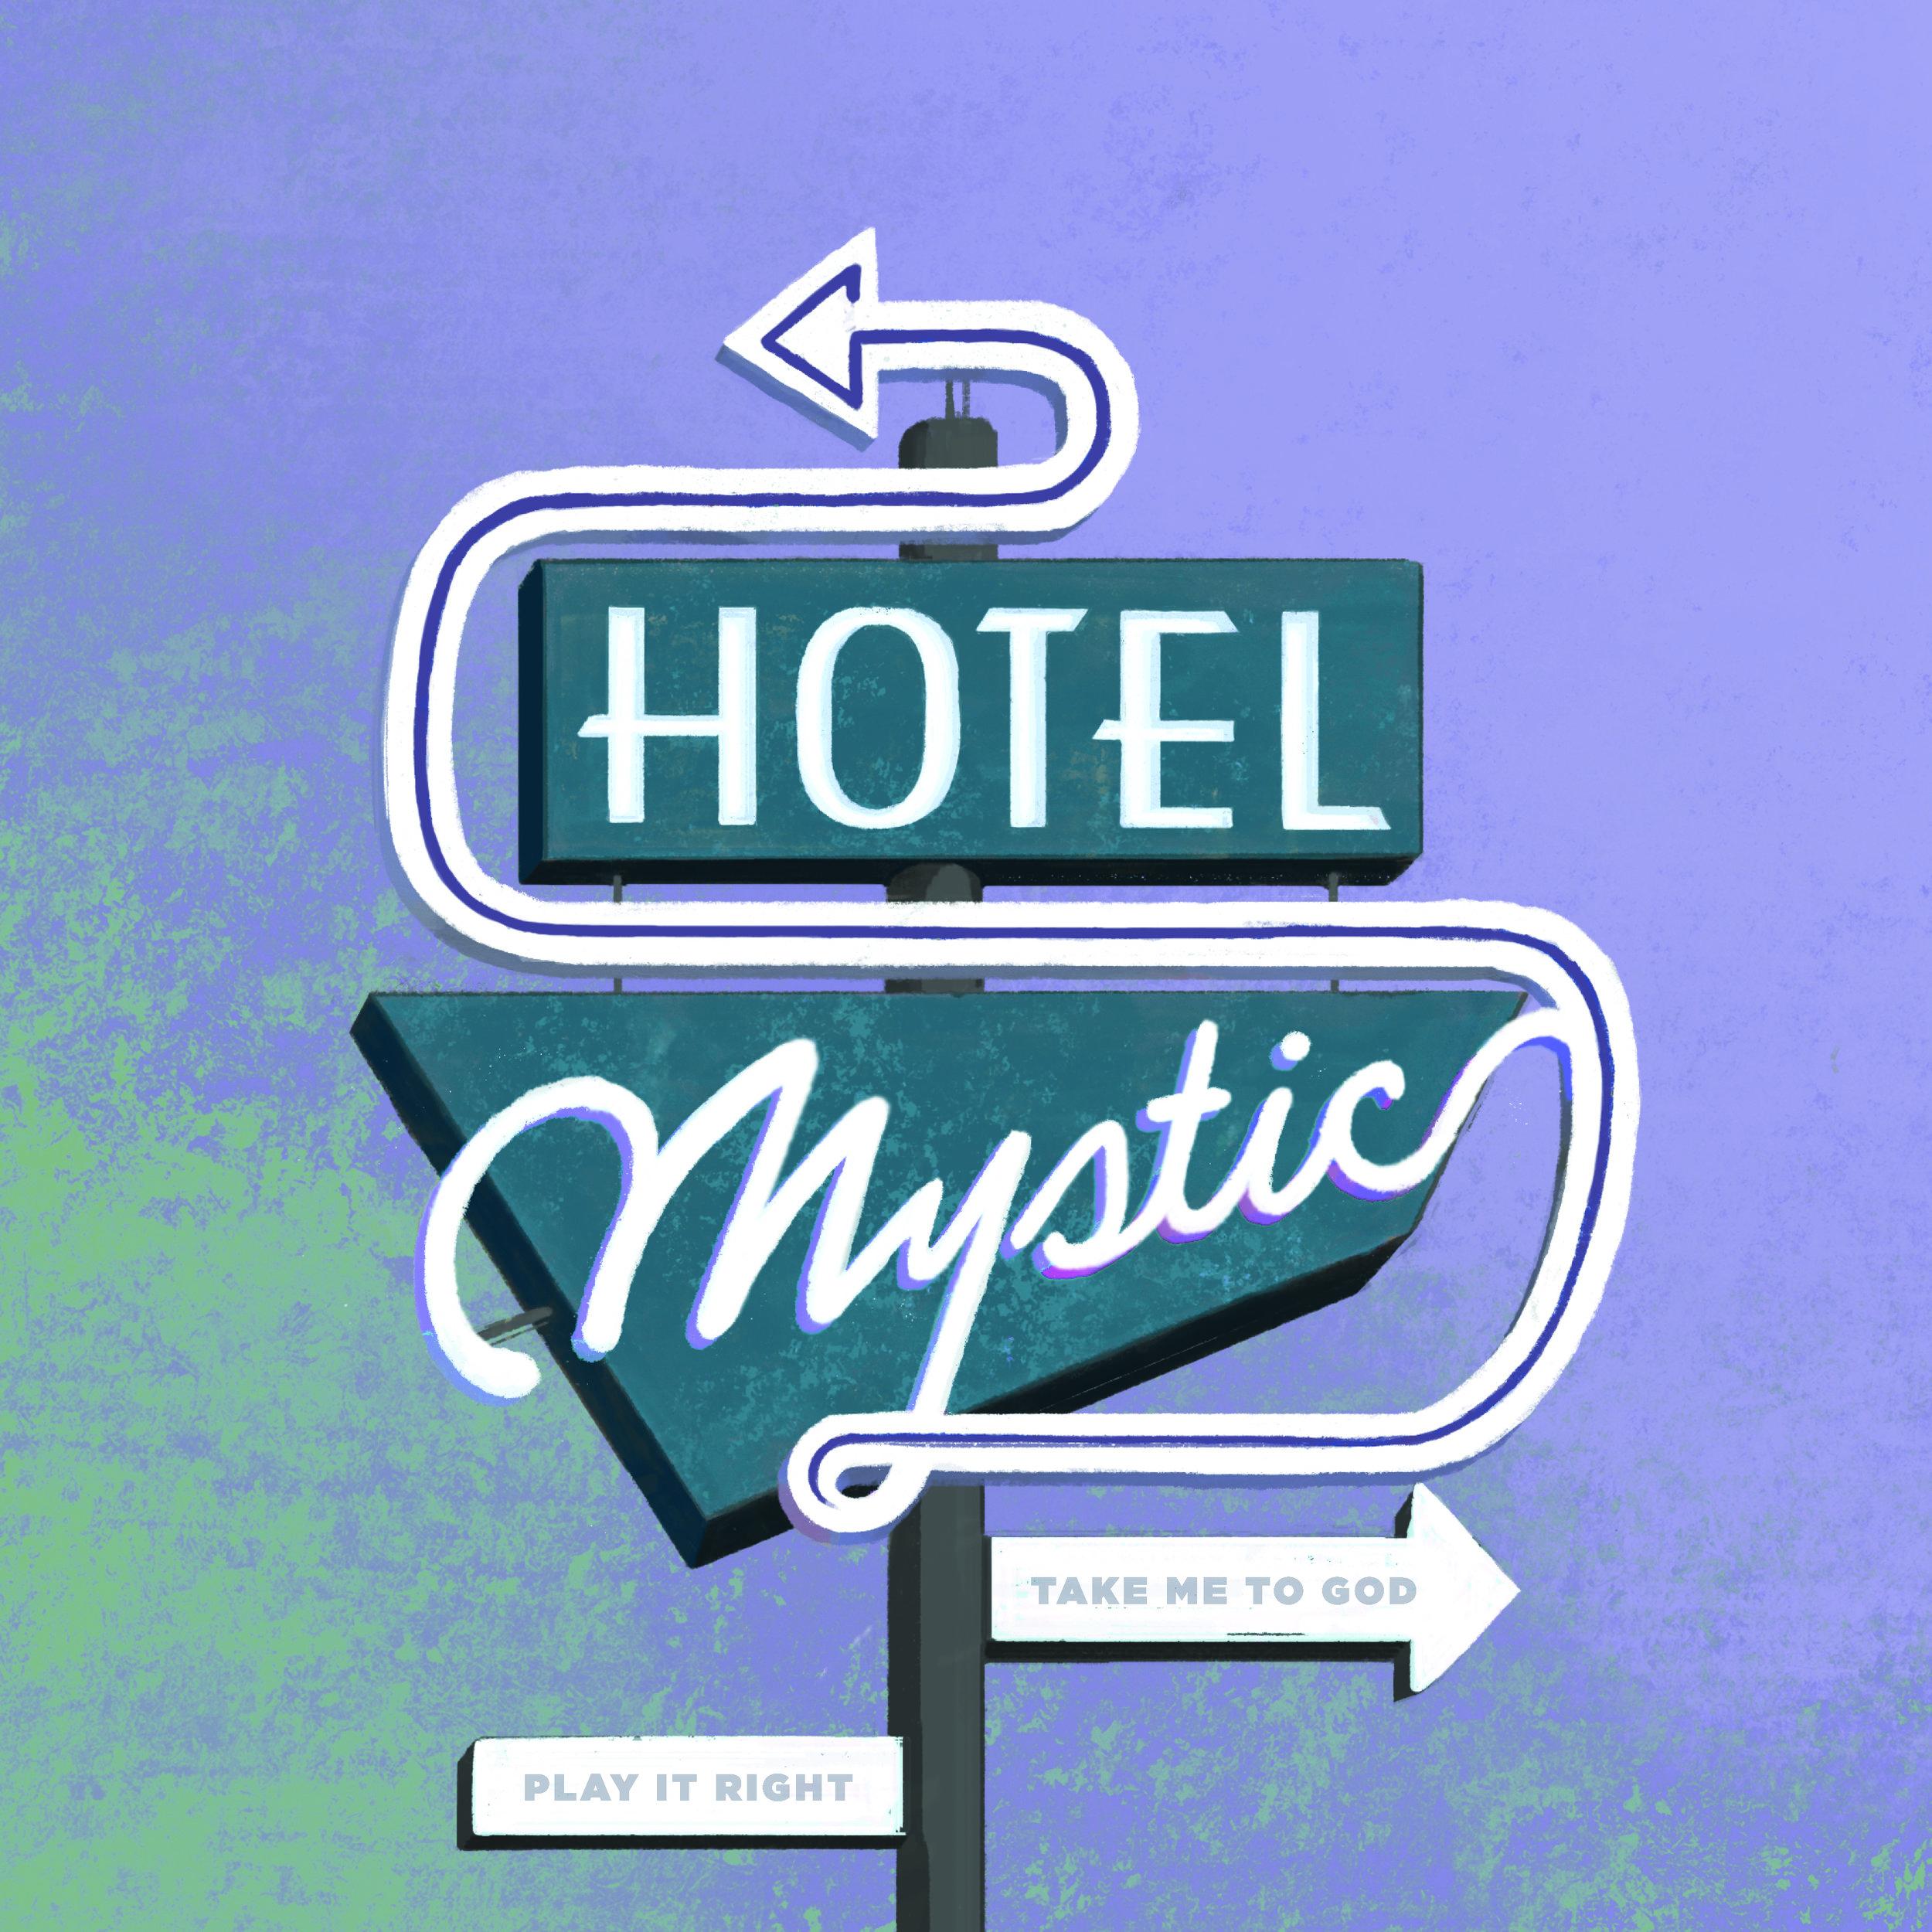 hotelmystic-sign.jpg